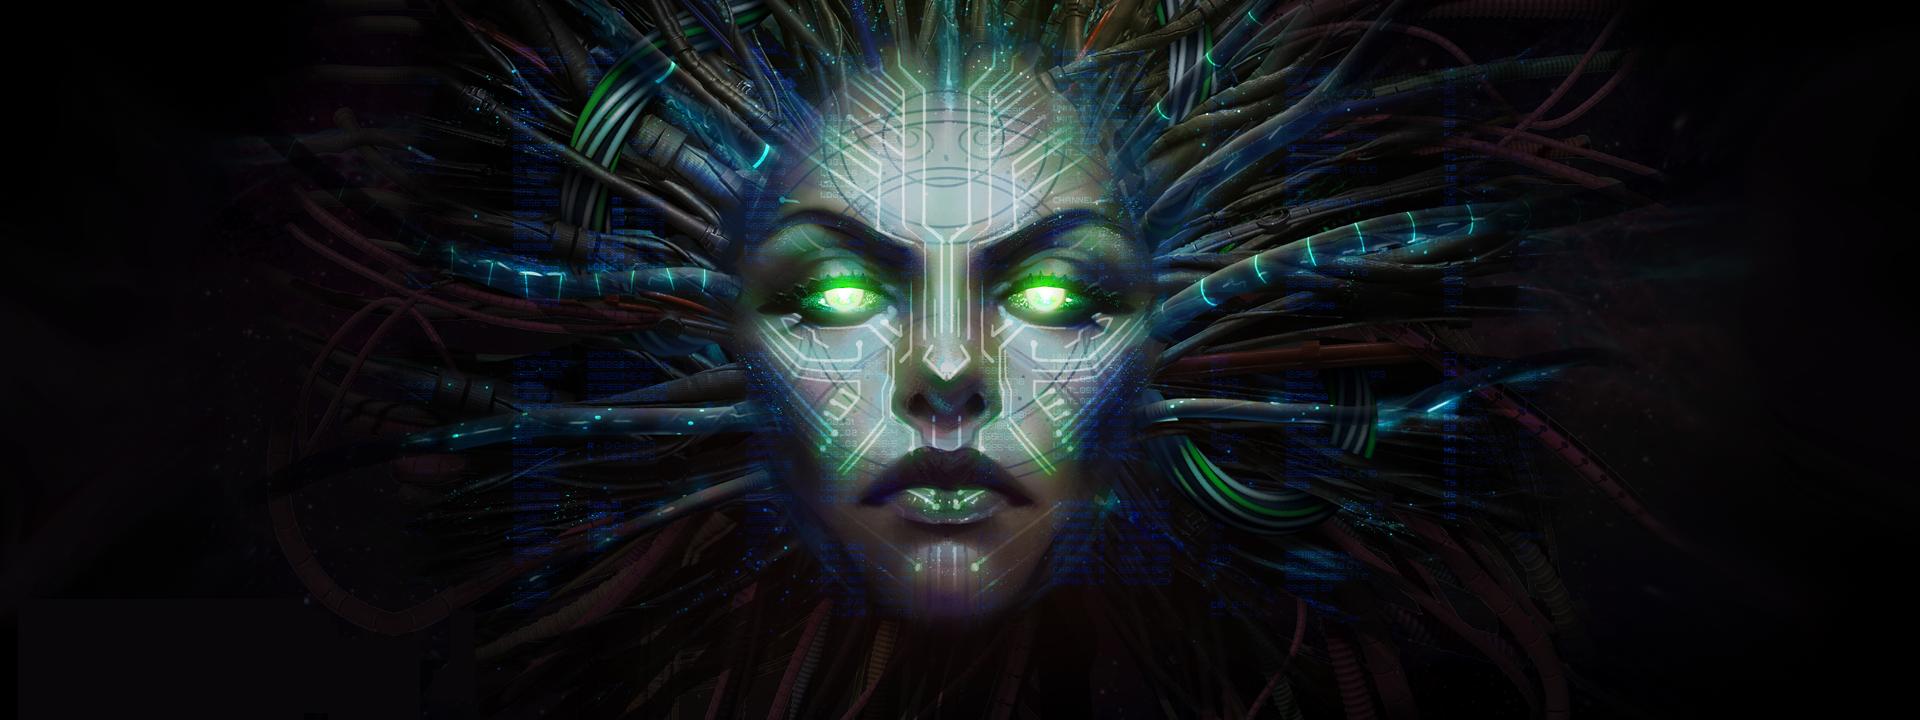 System Shock Shodan - AI